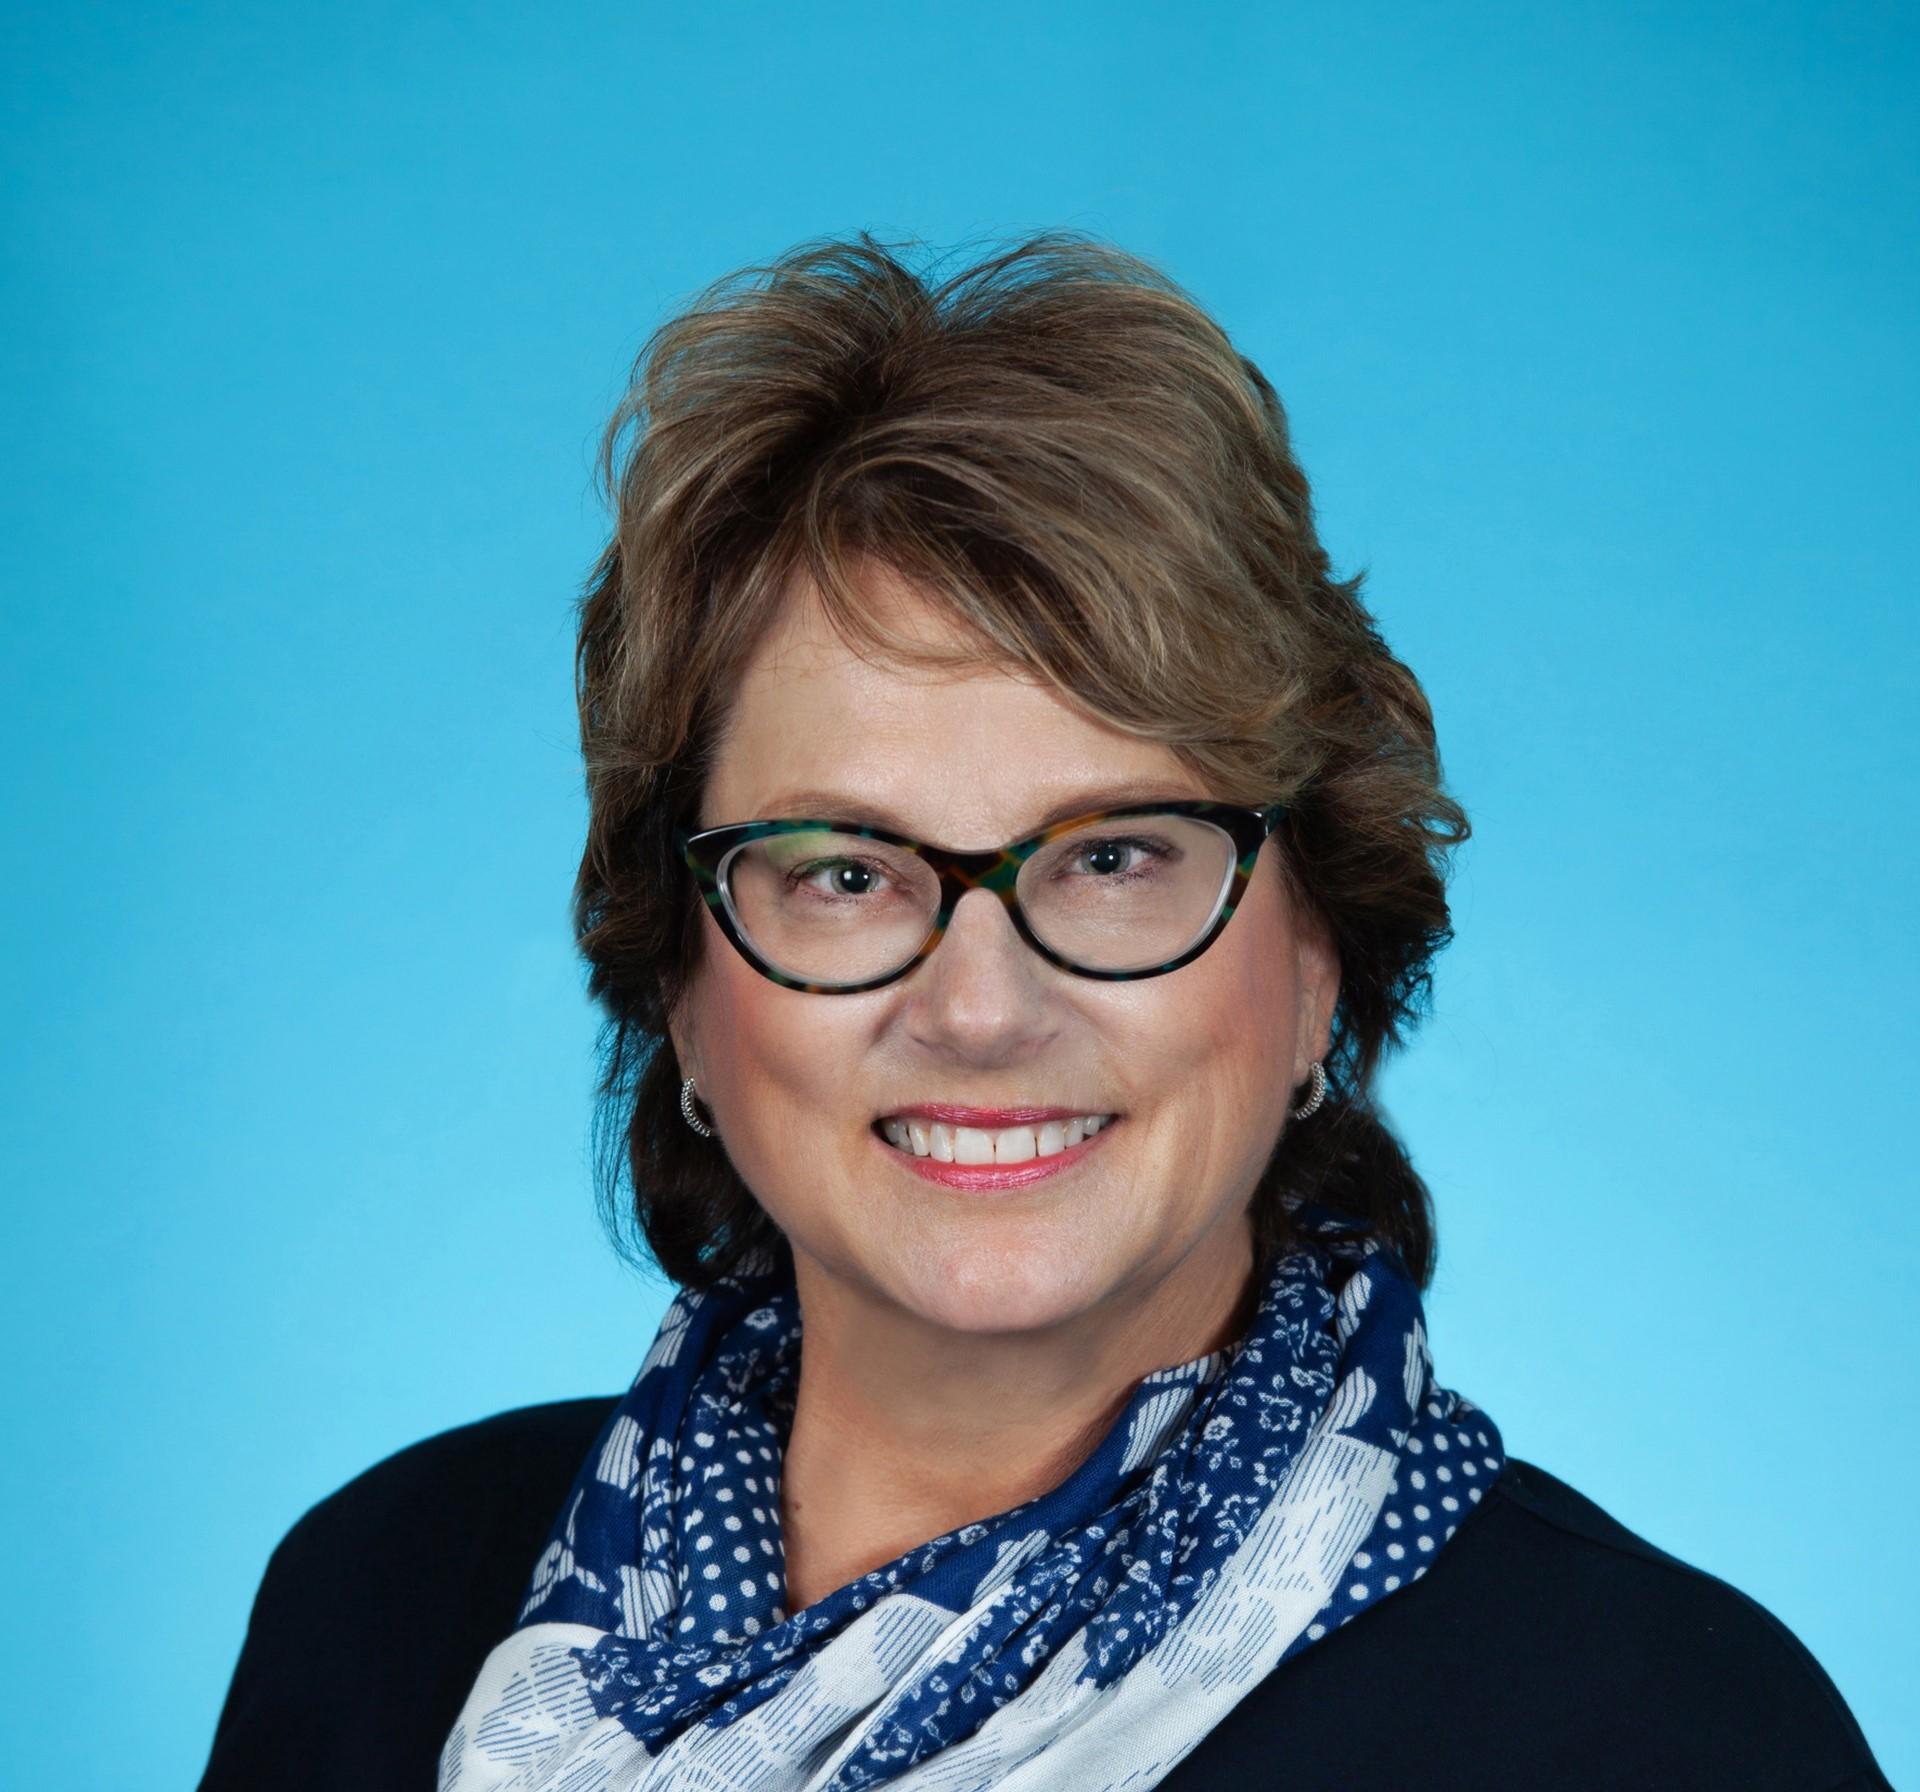 Deborah M. Cadwallader